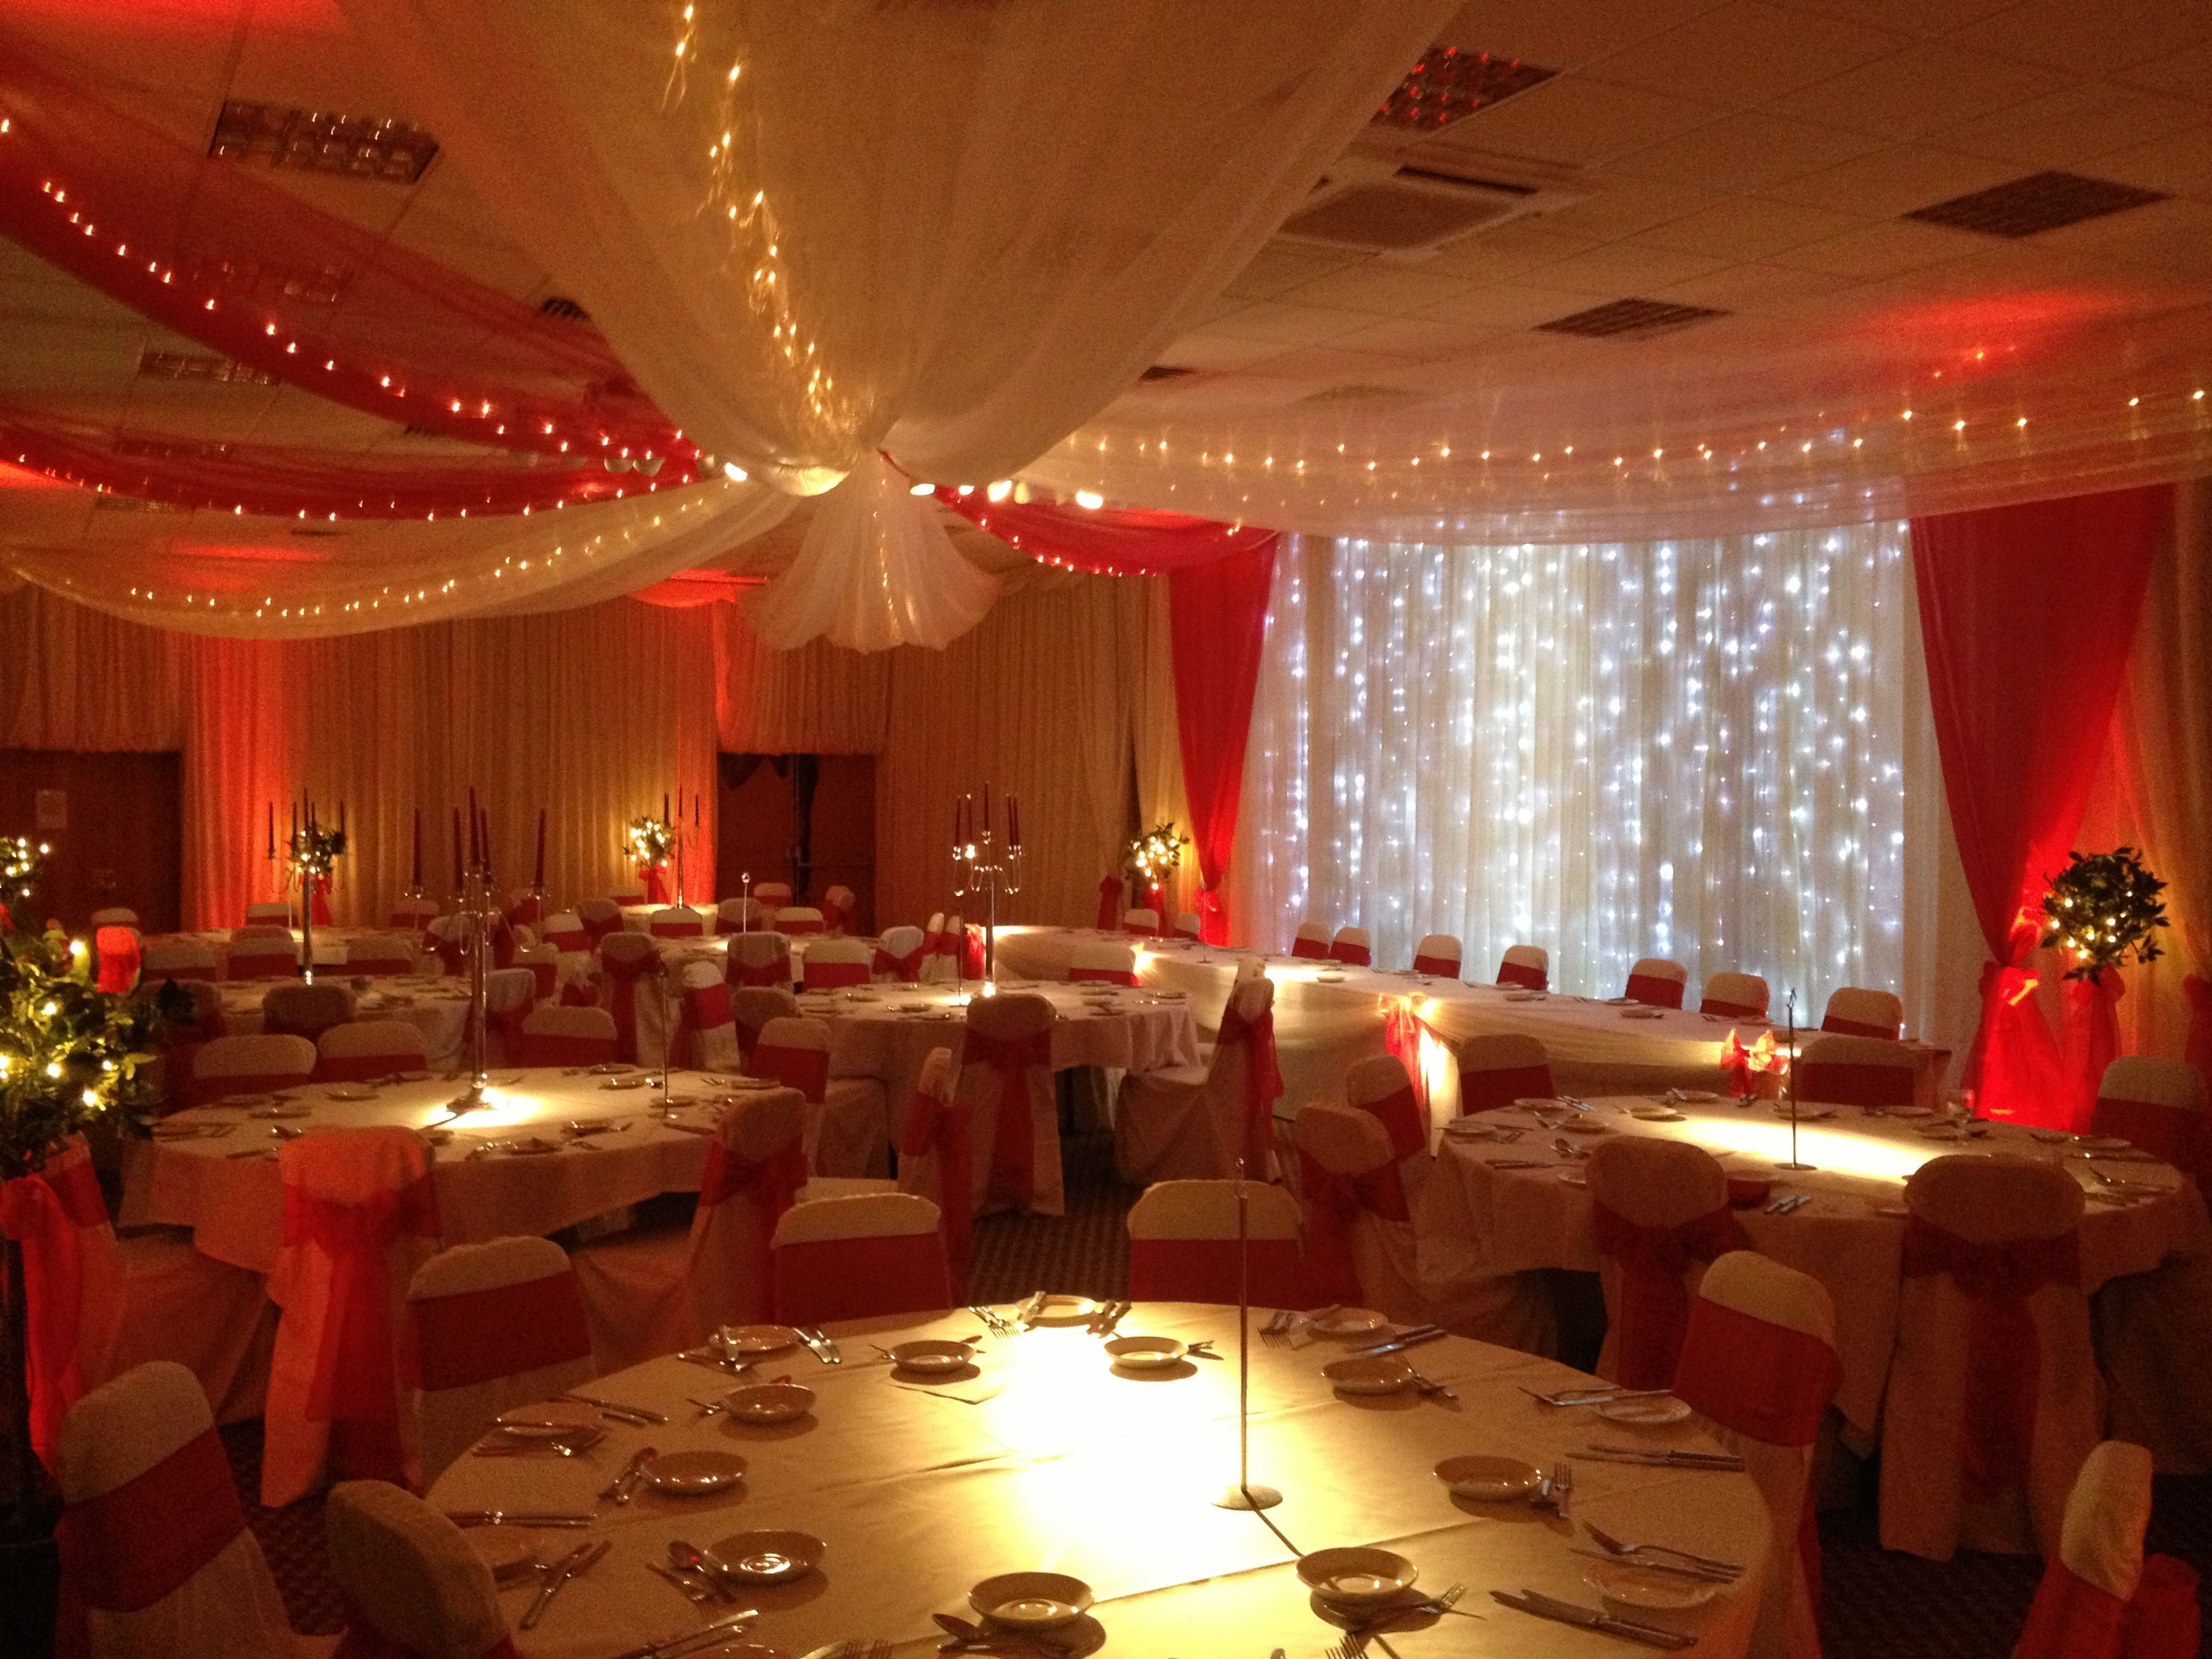 Organza u0026 fairy light canopy. & Organza u0026 fairy light canopy. | Decorating tips | Pinterest ...